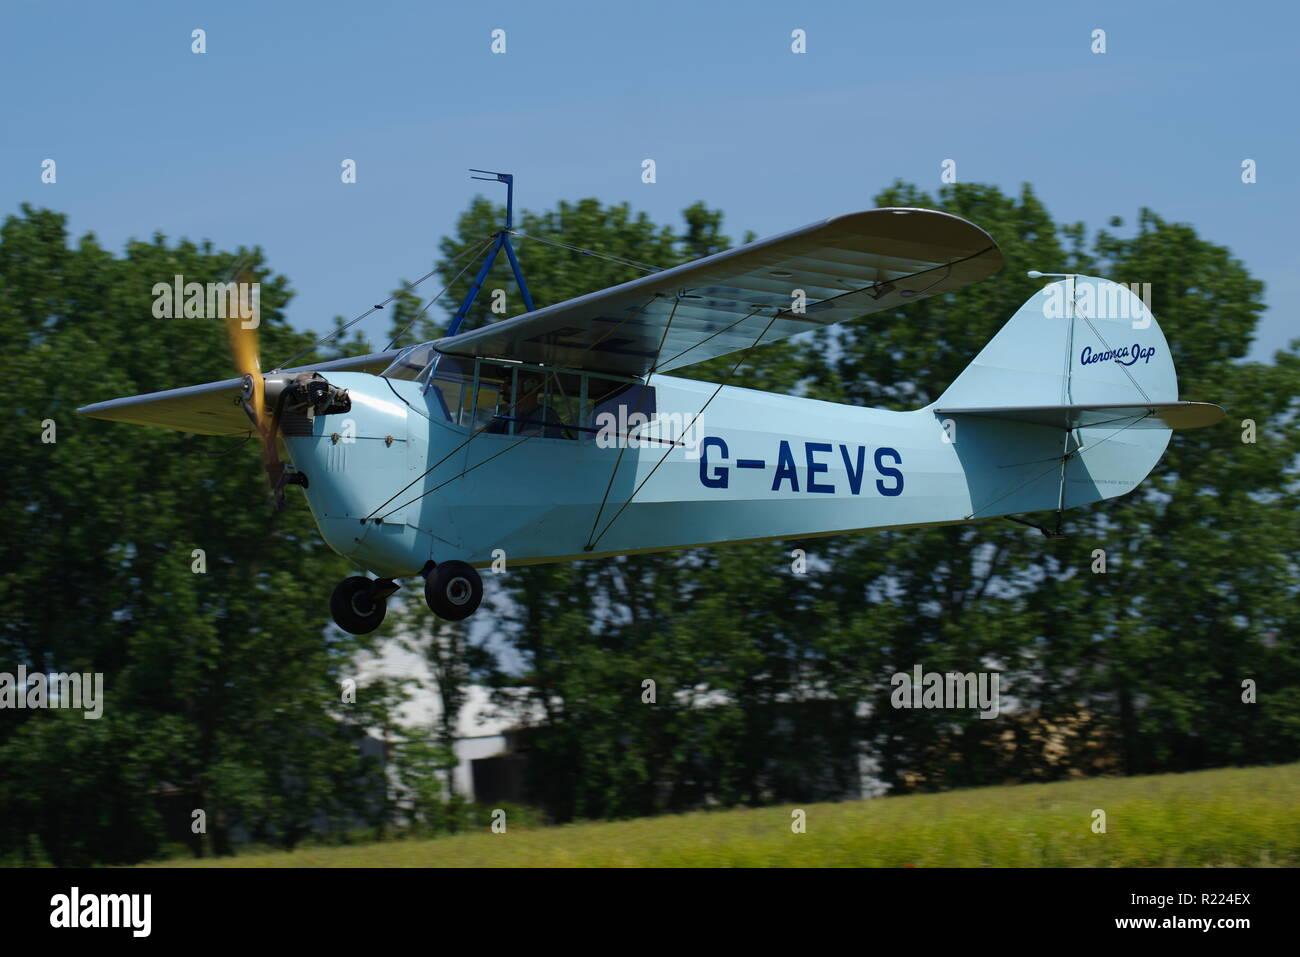 Aeronca, Monoplane - Stock Image